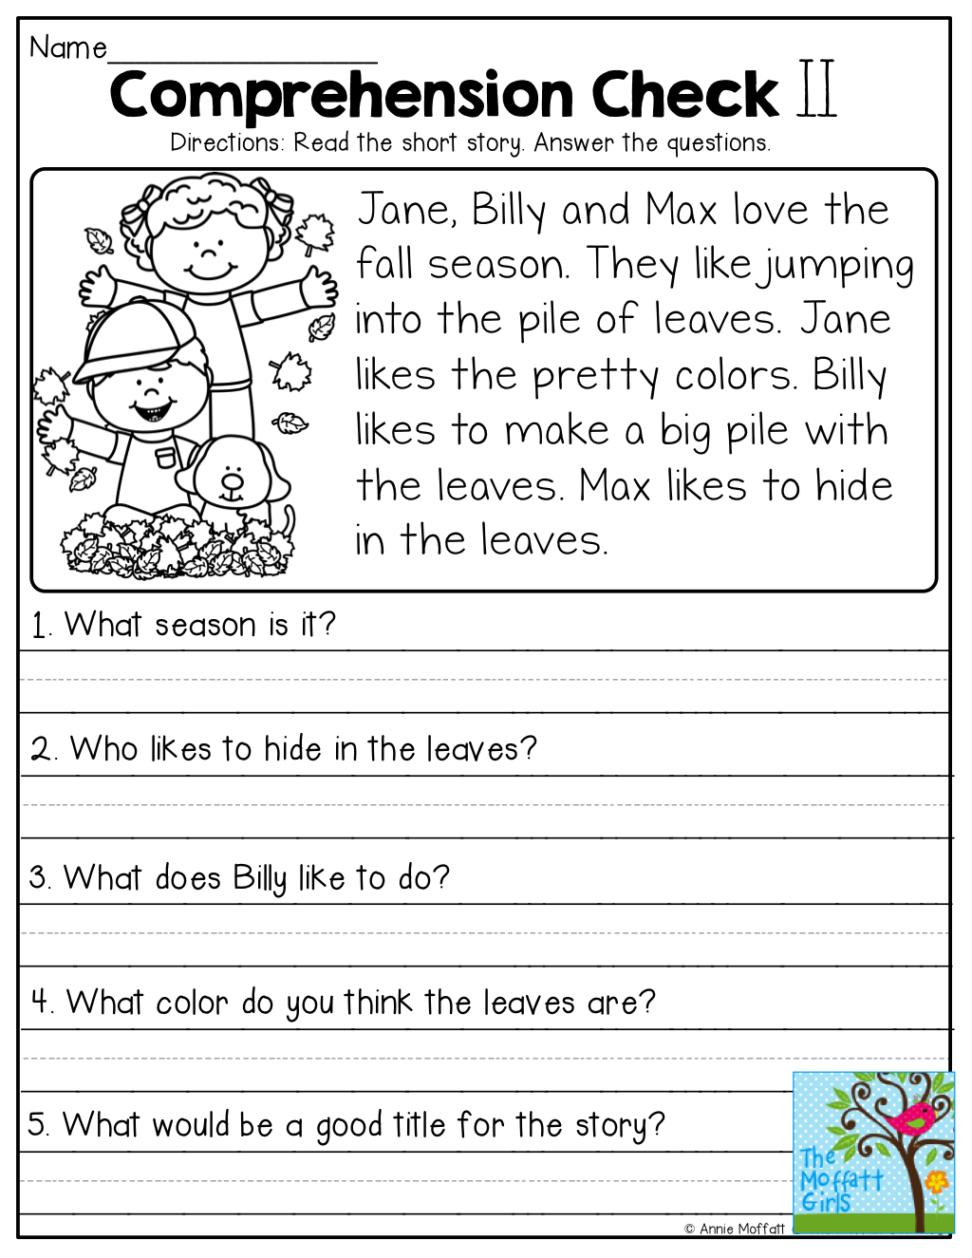 Worksheet. Free Printable Reading Comprehension Worksheets - Free Printable Reading Worksheets